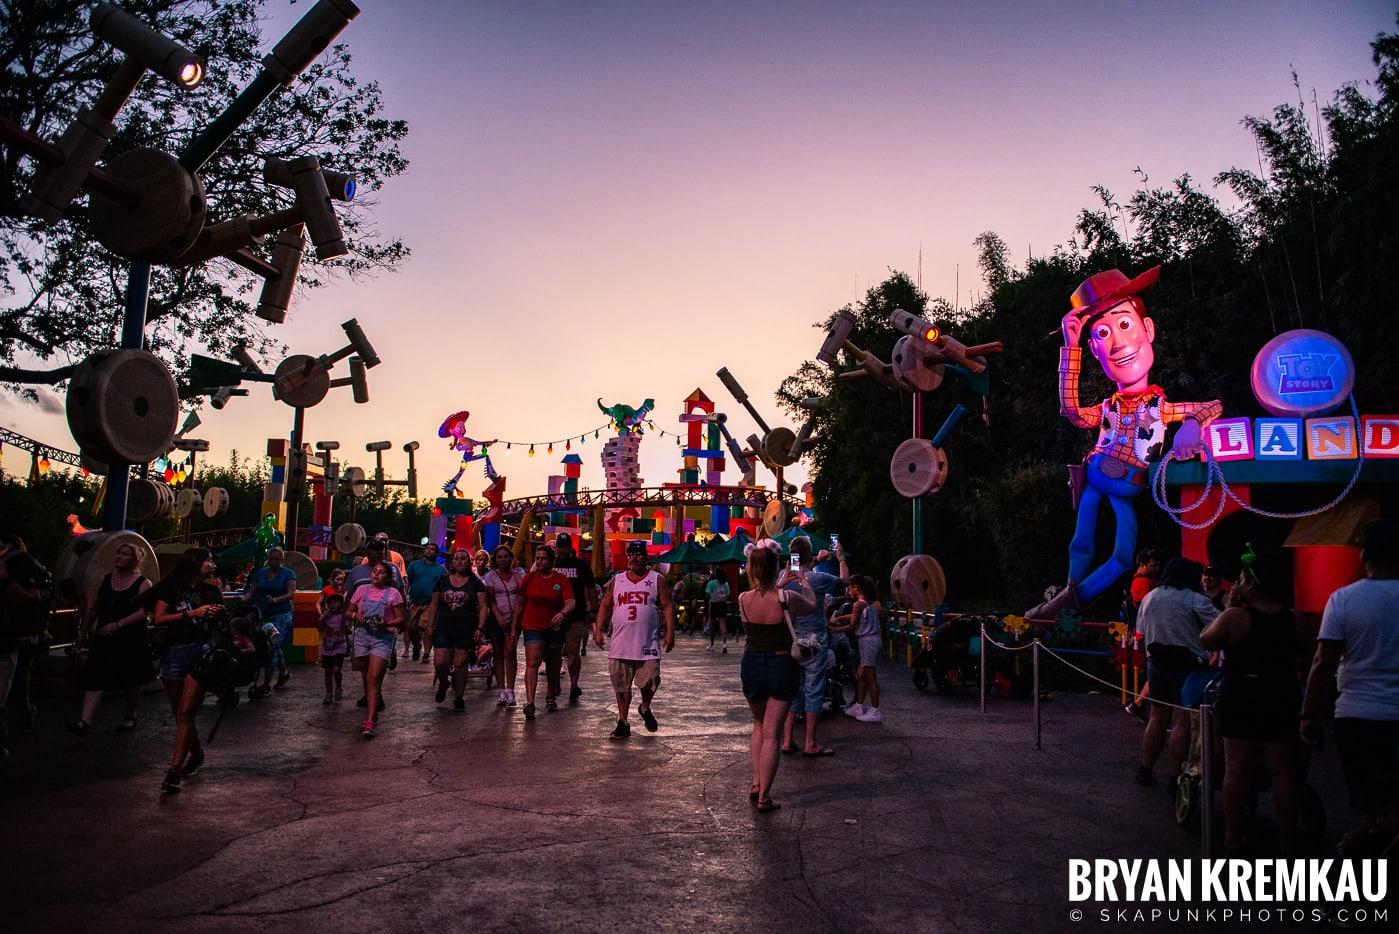 Walt Disney World Vacation: Day 5 (Animal Kingdom / Disney's Hollywood Studios) - 10.3.19 (45)